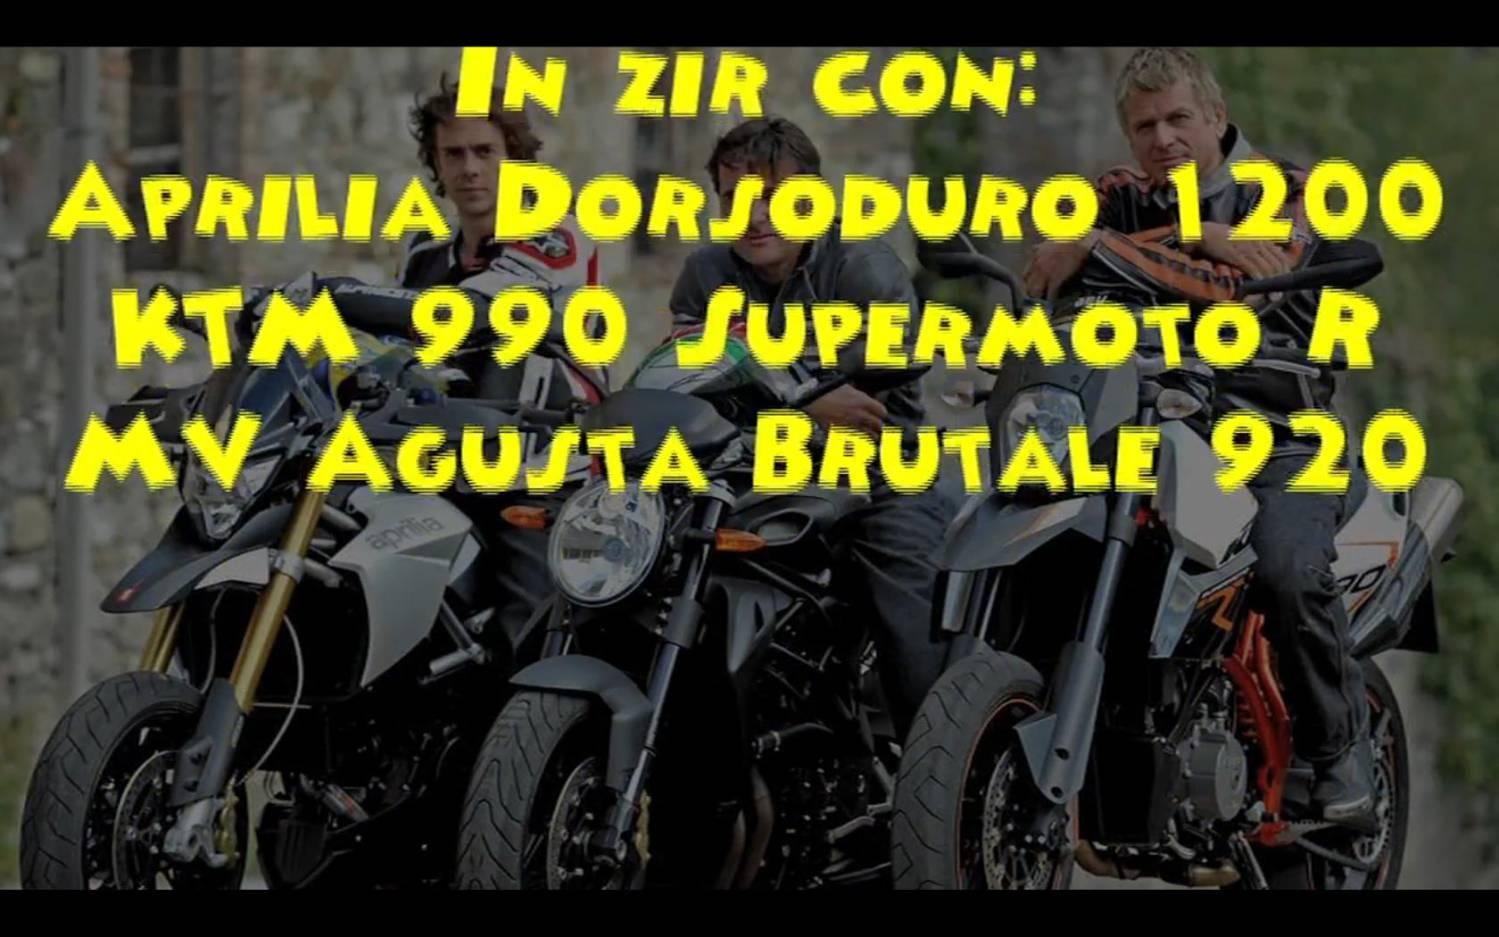 Aprilia Dorsoduro 1200 vs KTM 990 Supermoto R vs Agusta Brutale 920